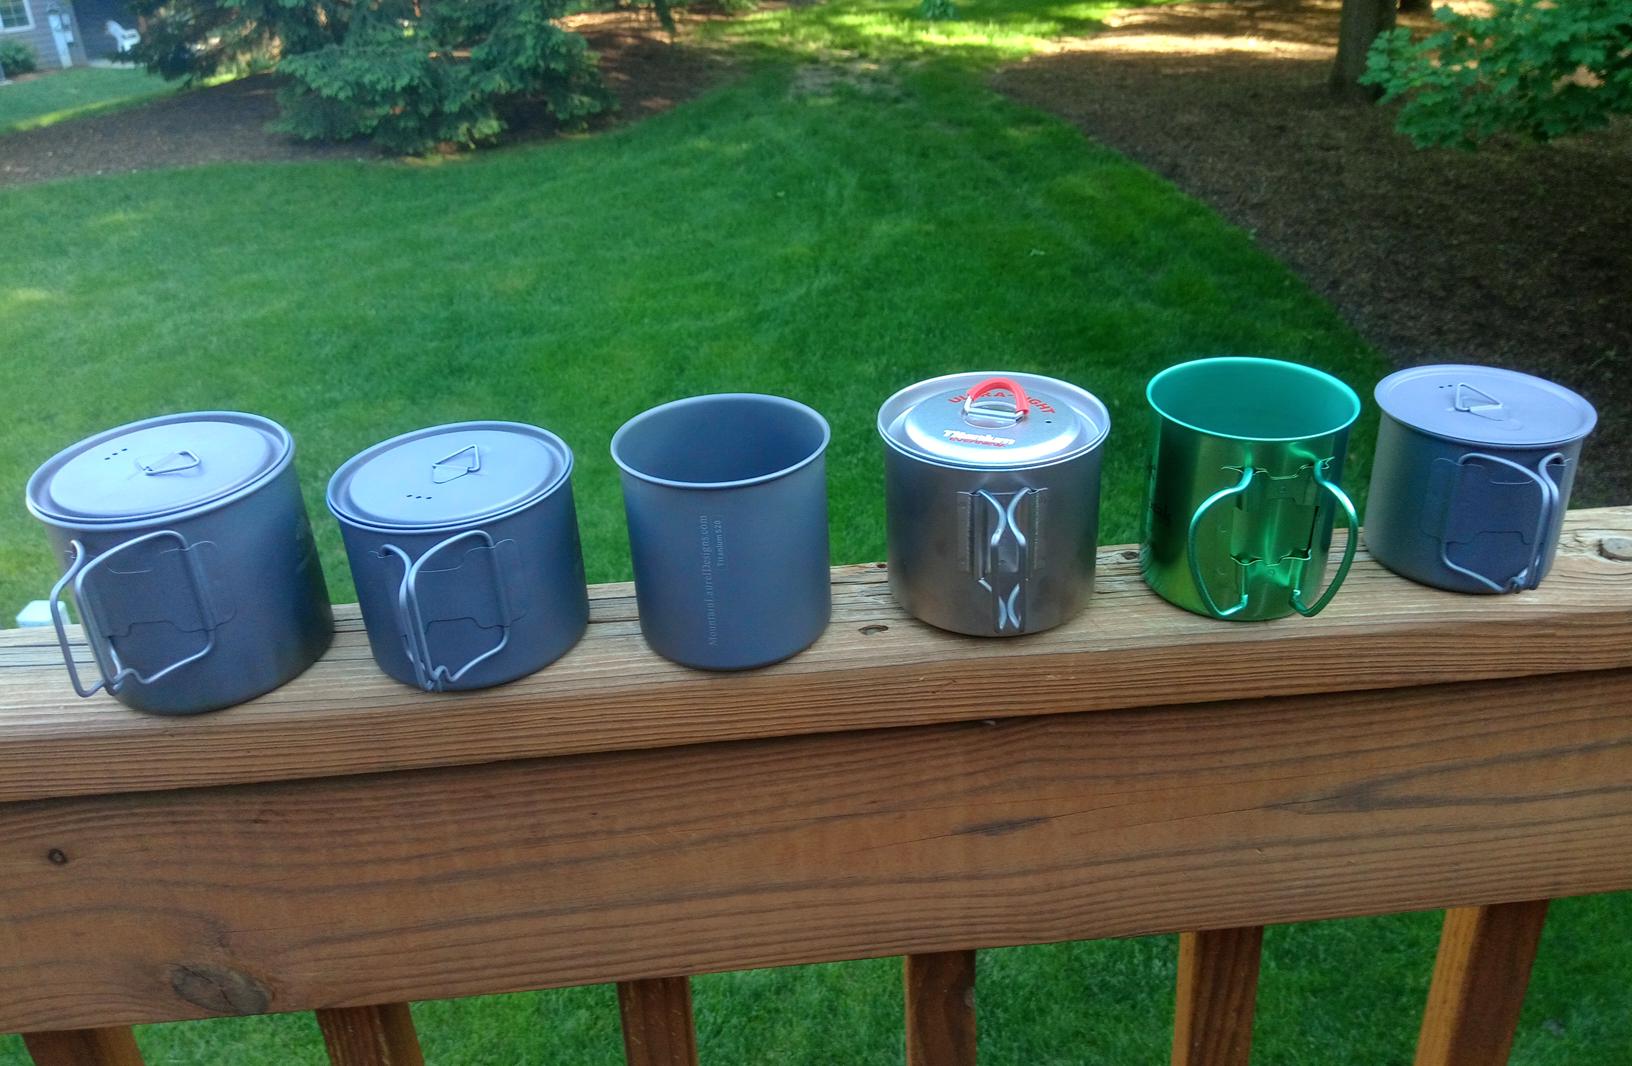 Lots of small Ti pots